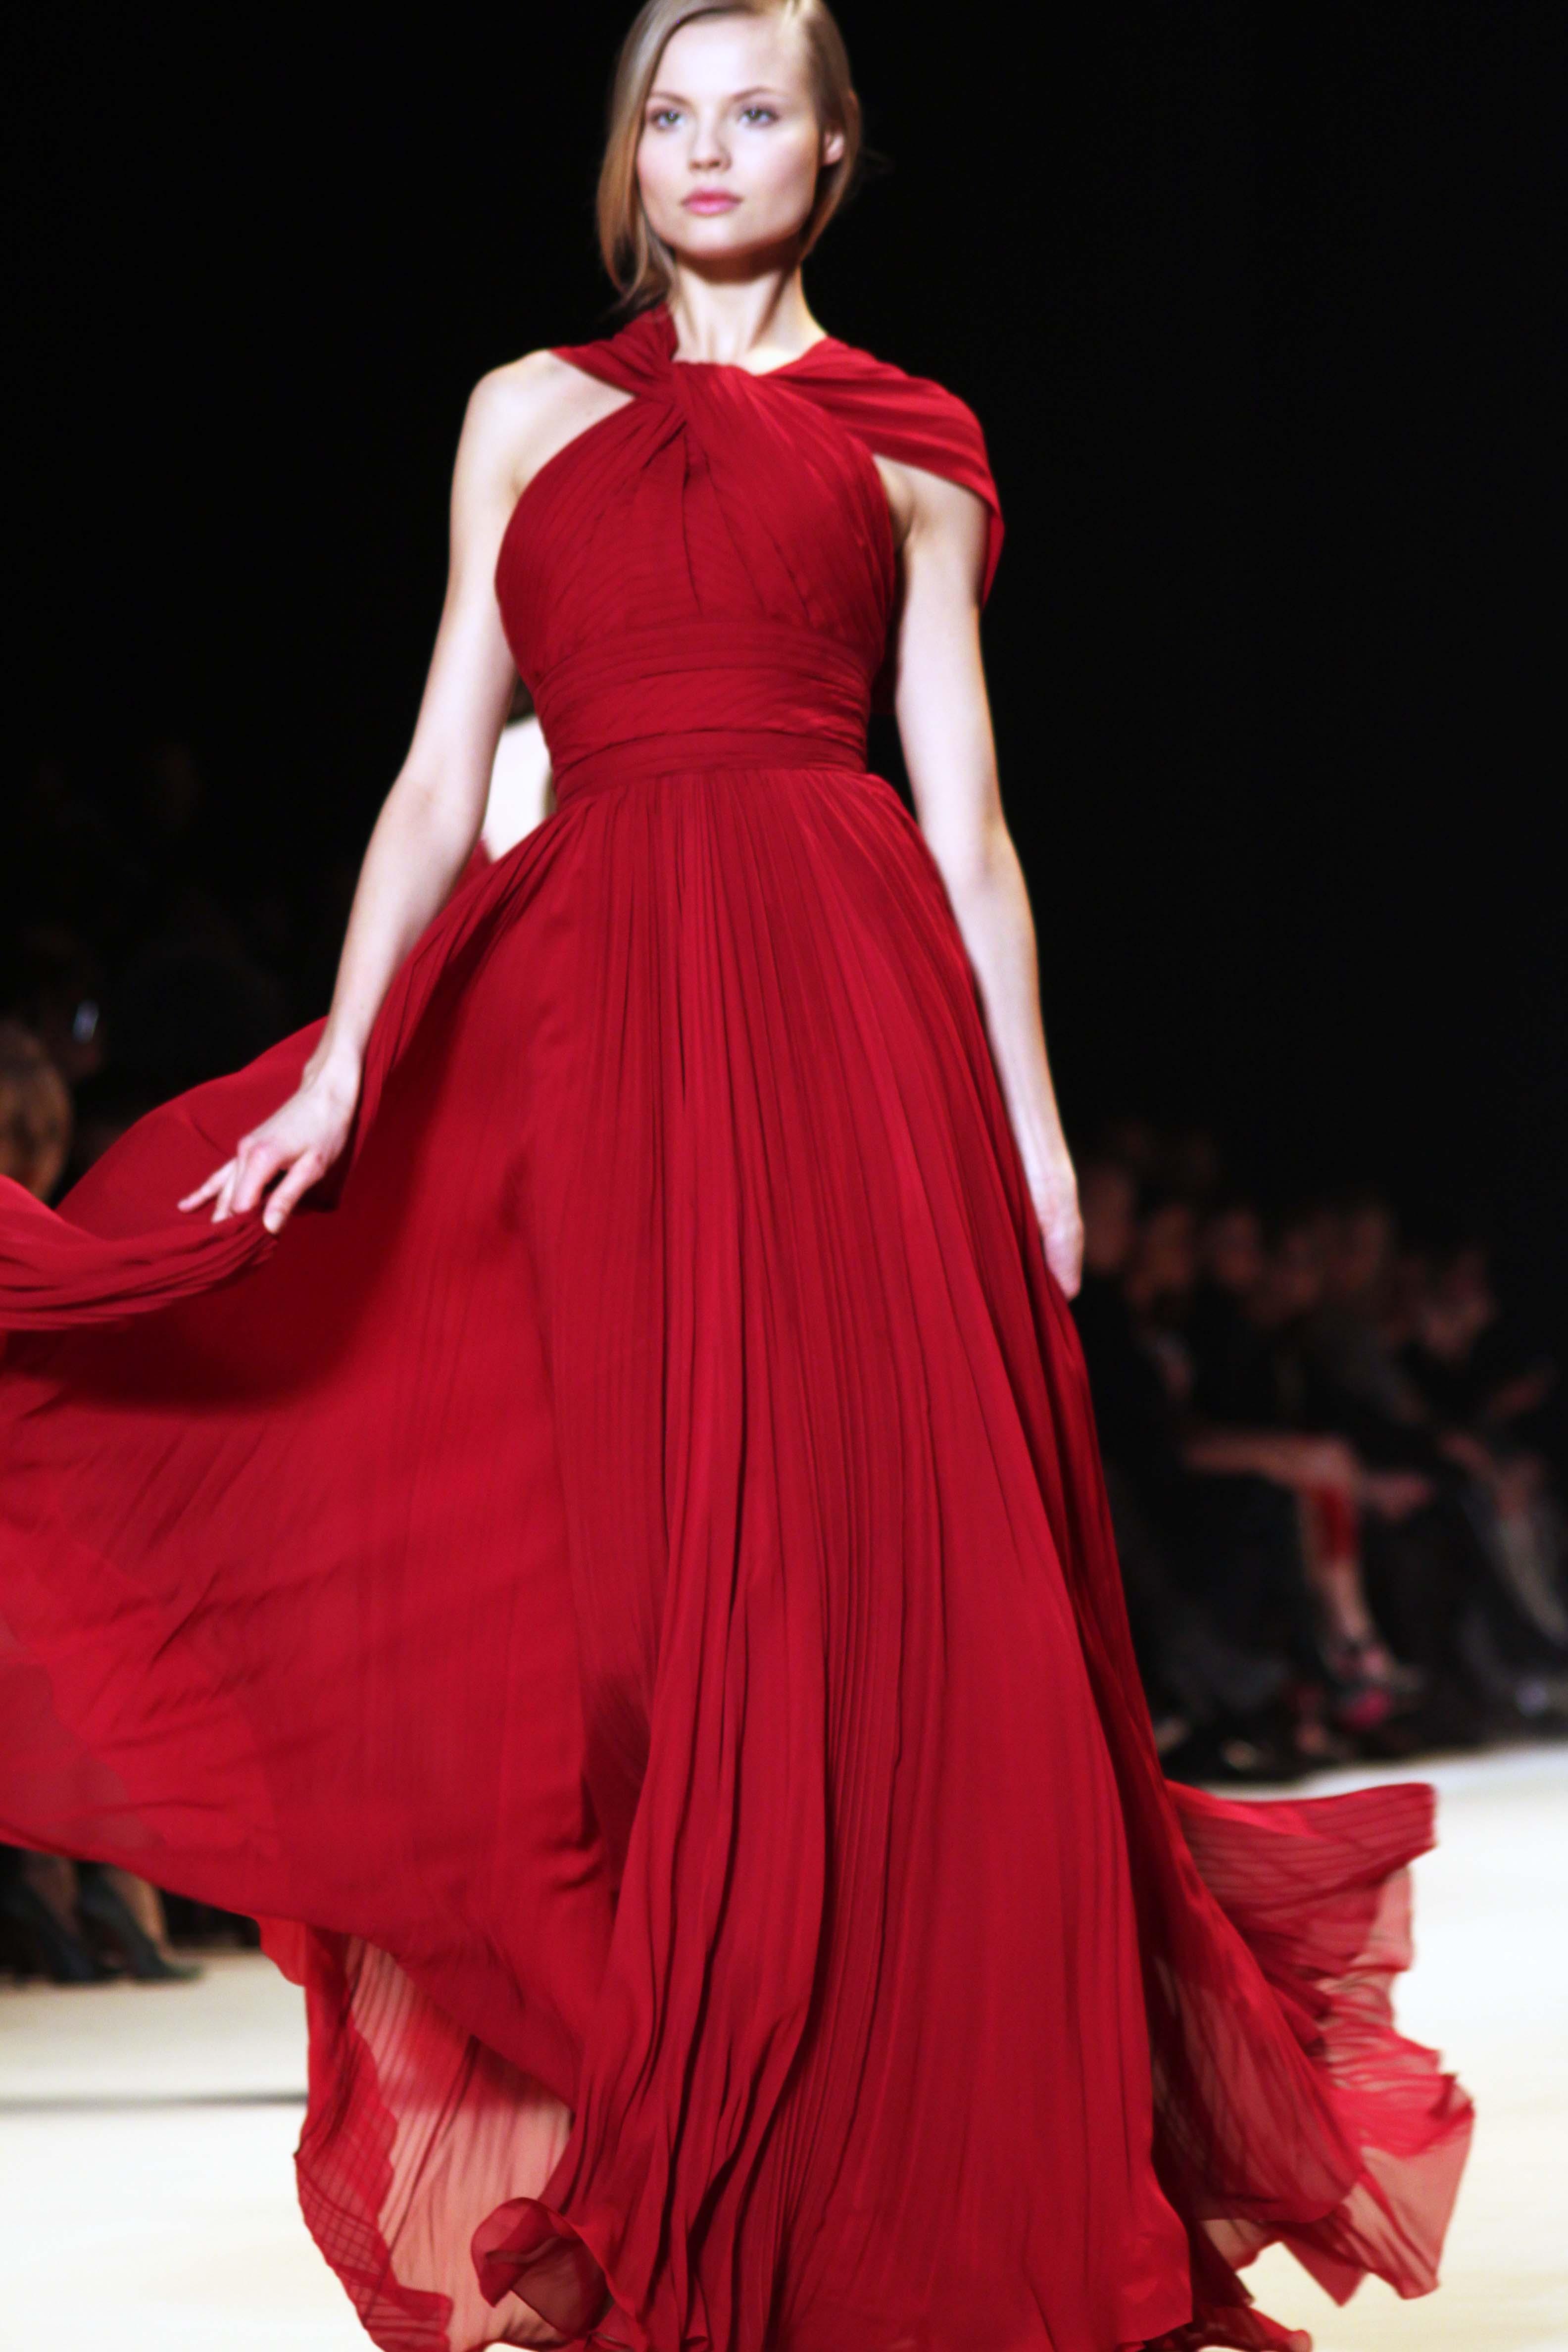 Fashion Show Invitation with nice invitation example